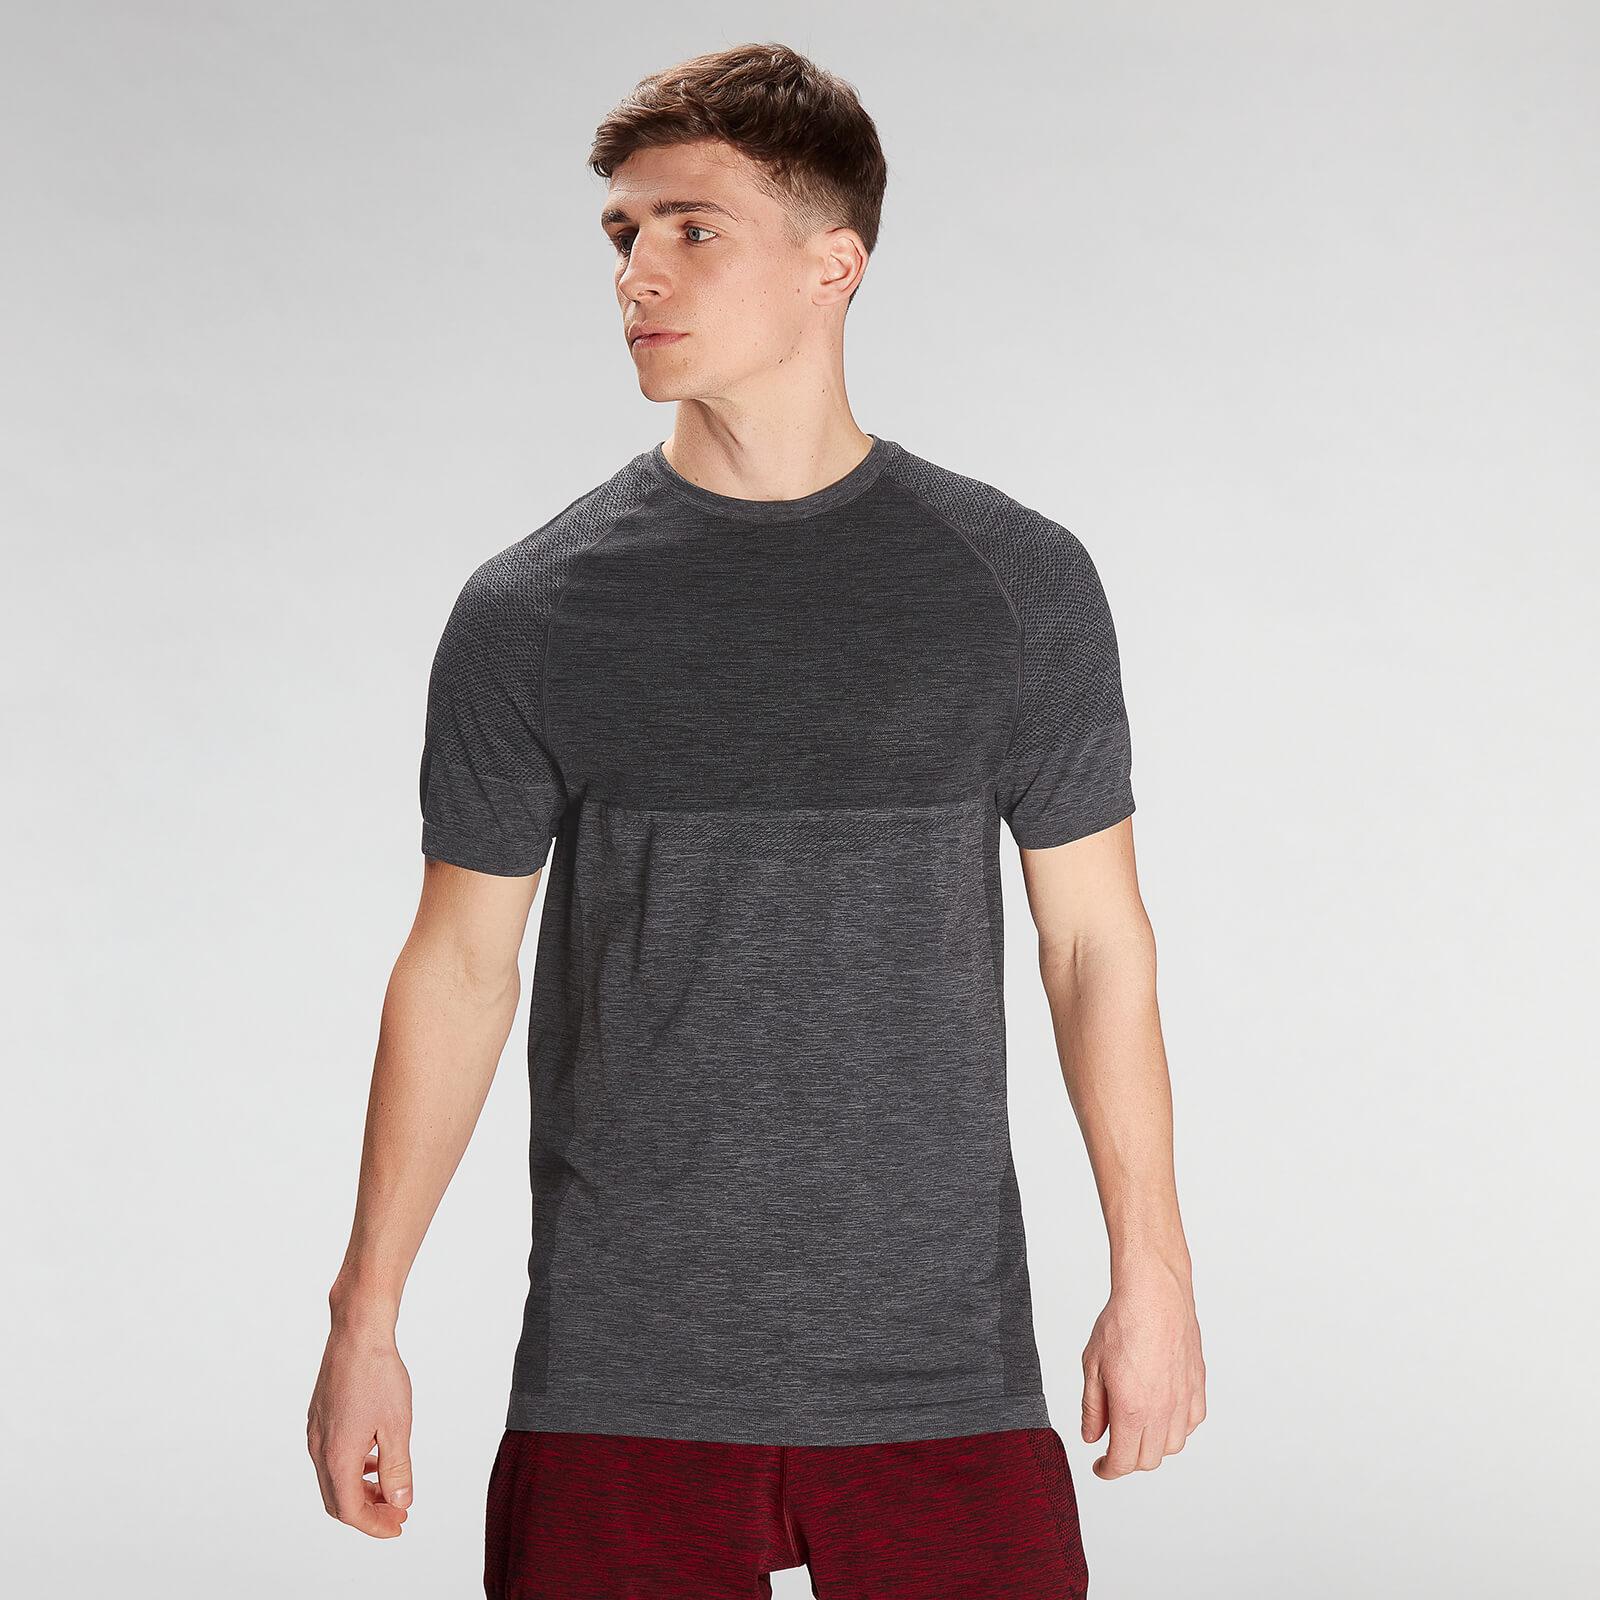 Купить MP Men's Essential Seamless Short Sleeve T-Shirt- Storm Grey Marl - XXL, Myprotein International